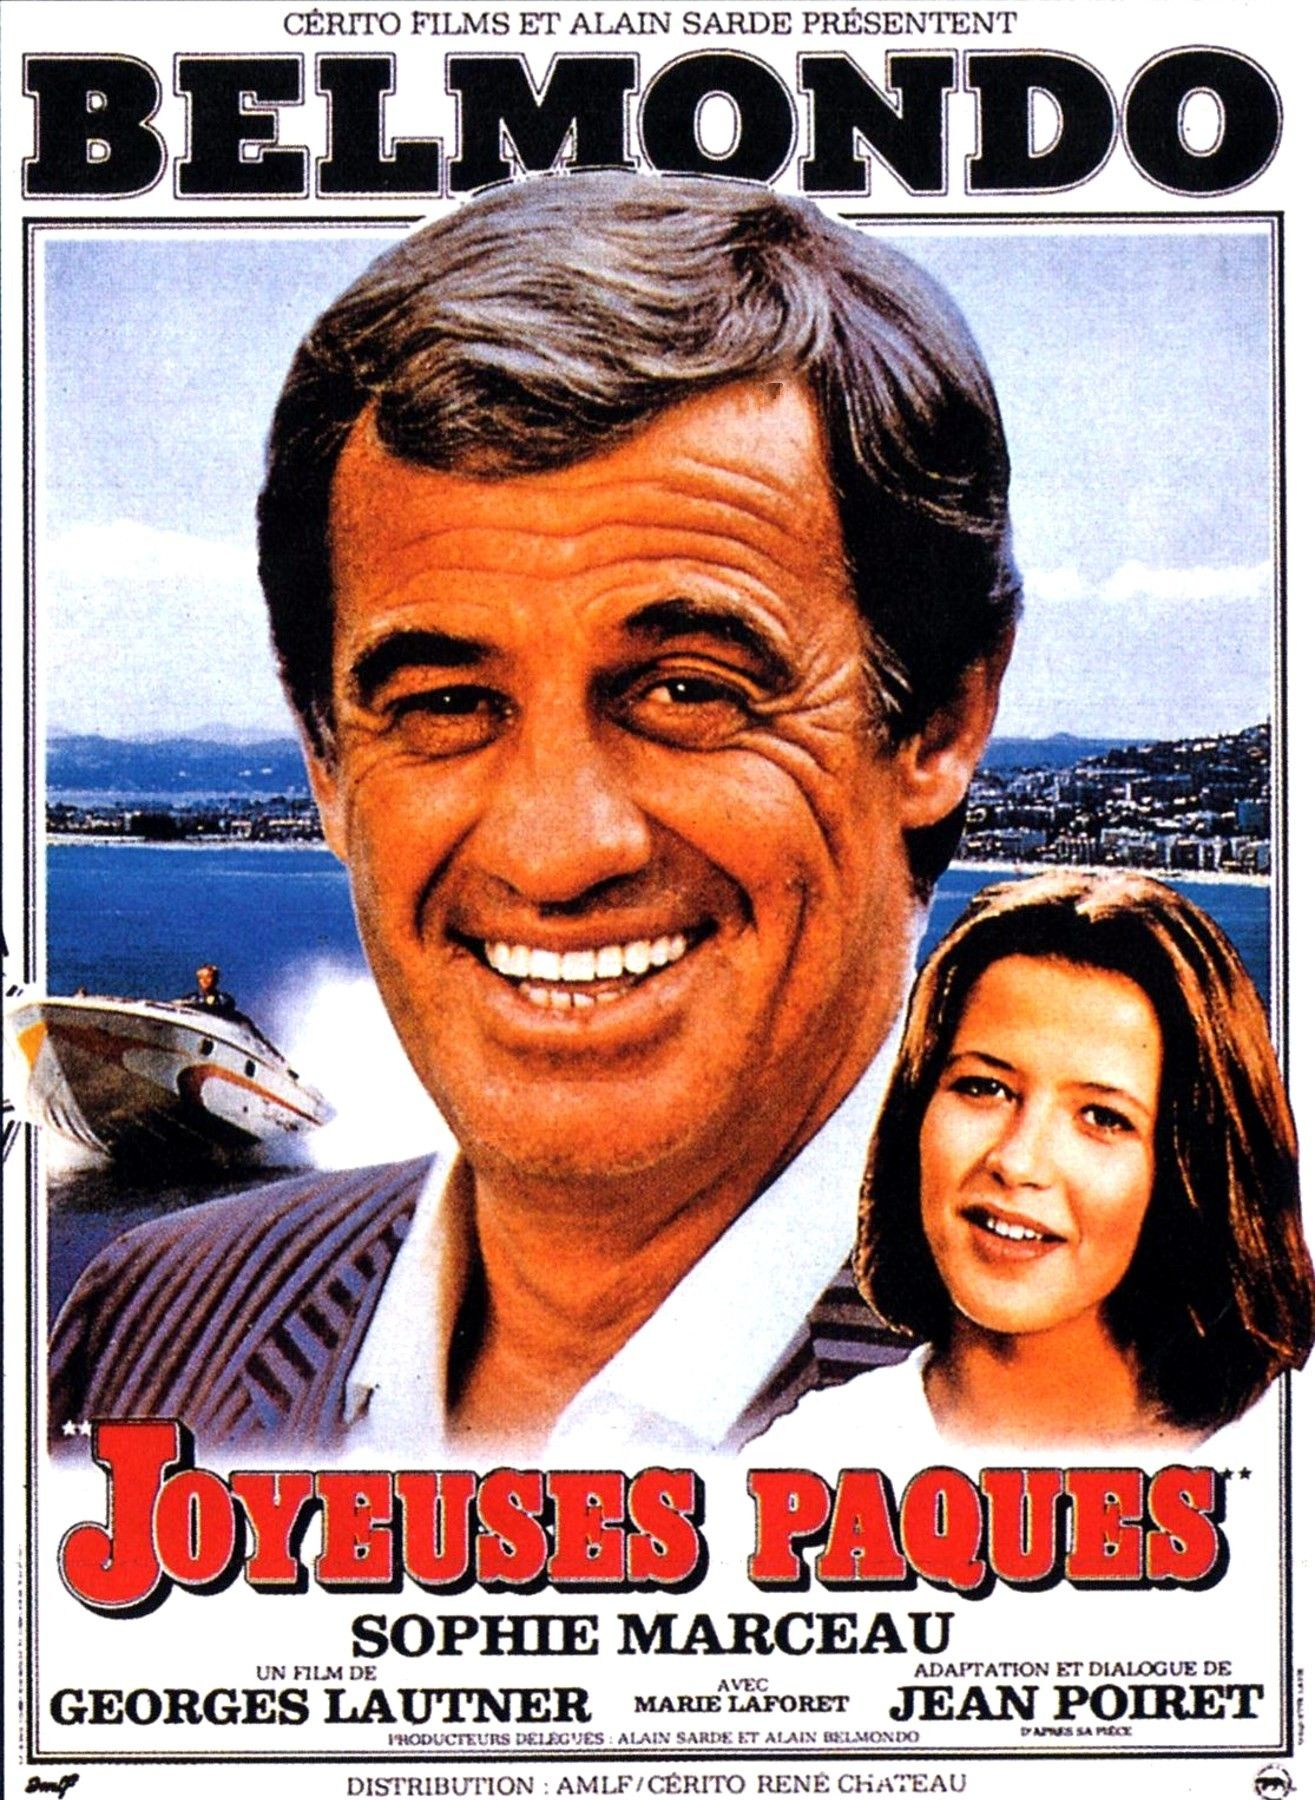 Joyeuses pâques 1984 Jean paul belmondo, Belmondo film